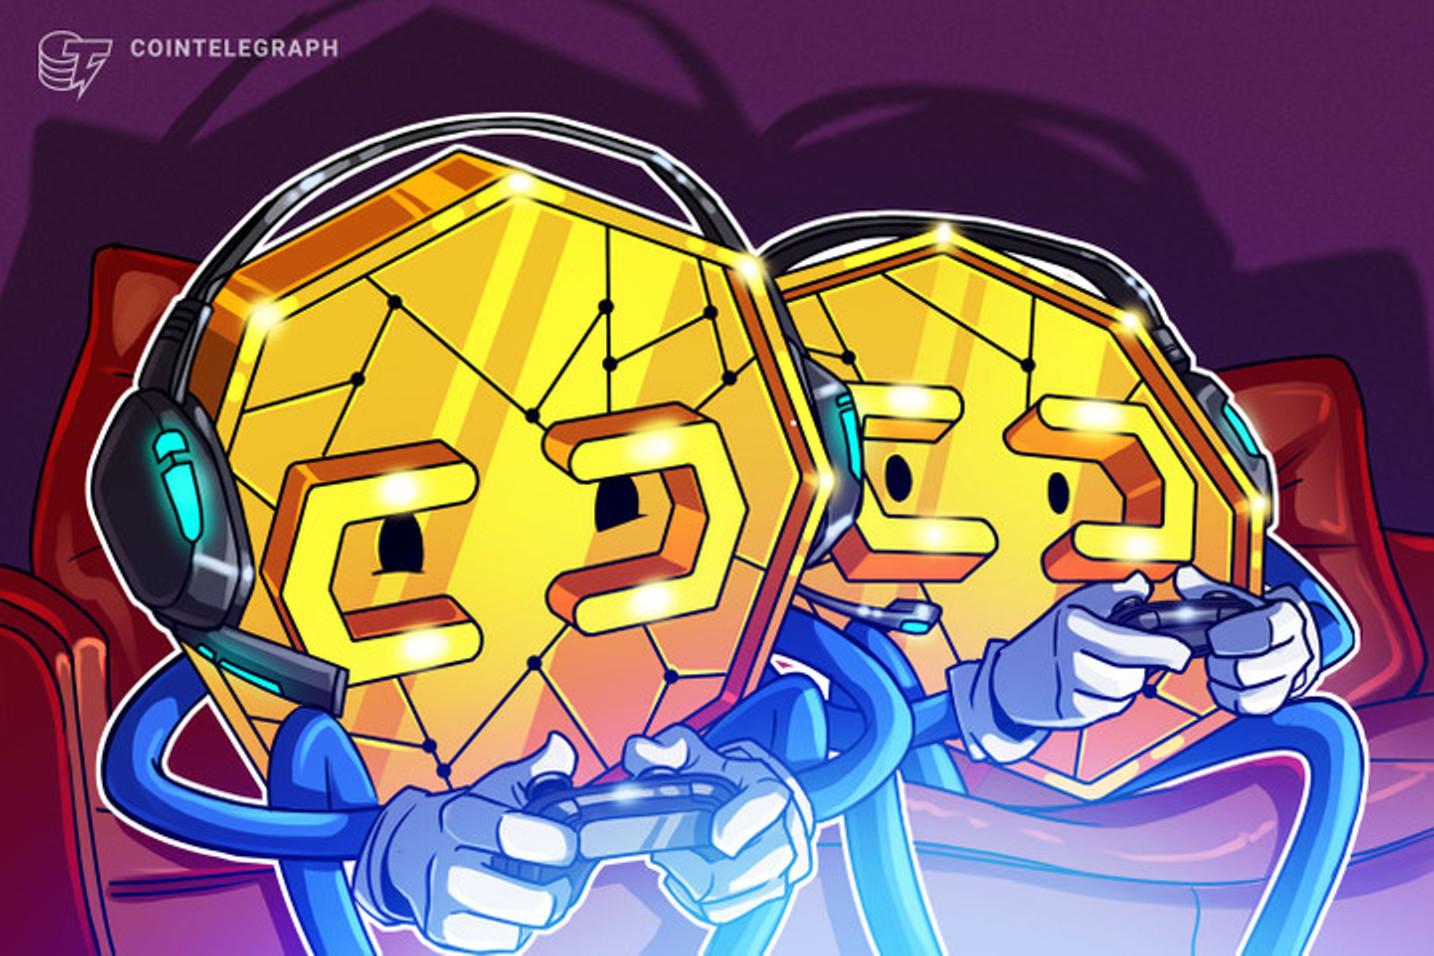 Aguardado game GTA 6 pode integrar criptomoedas nativas para pagamentos dentro do jogo